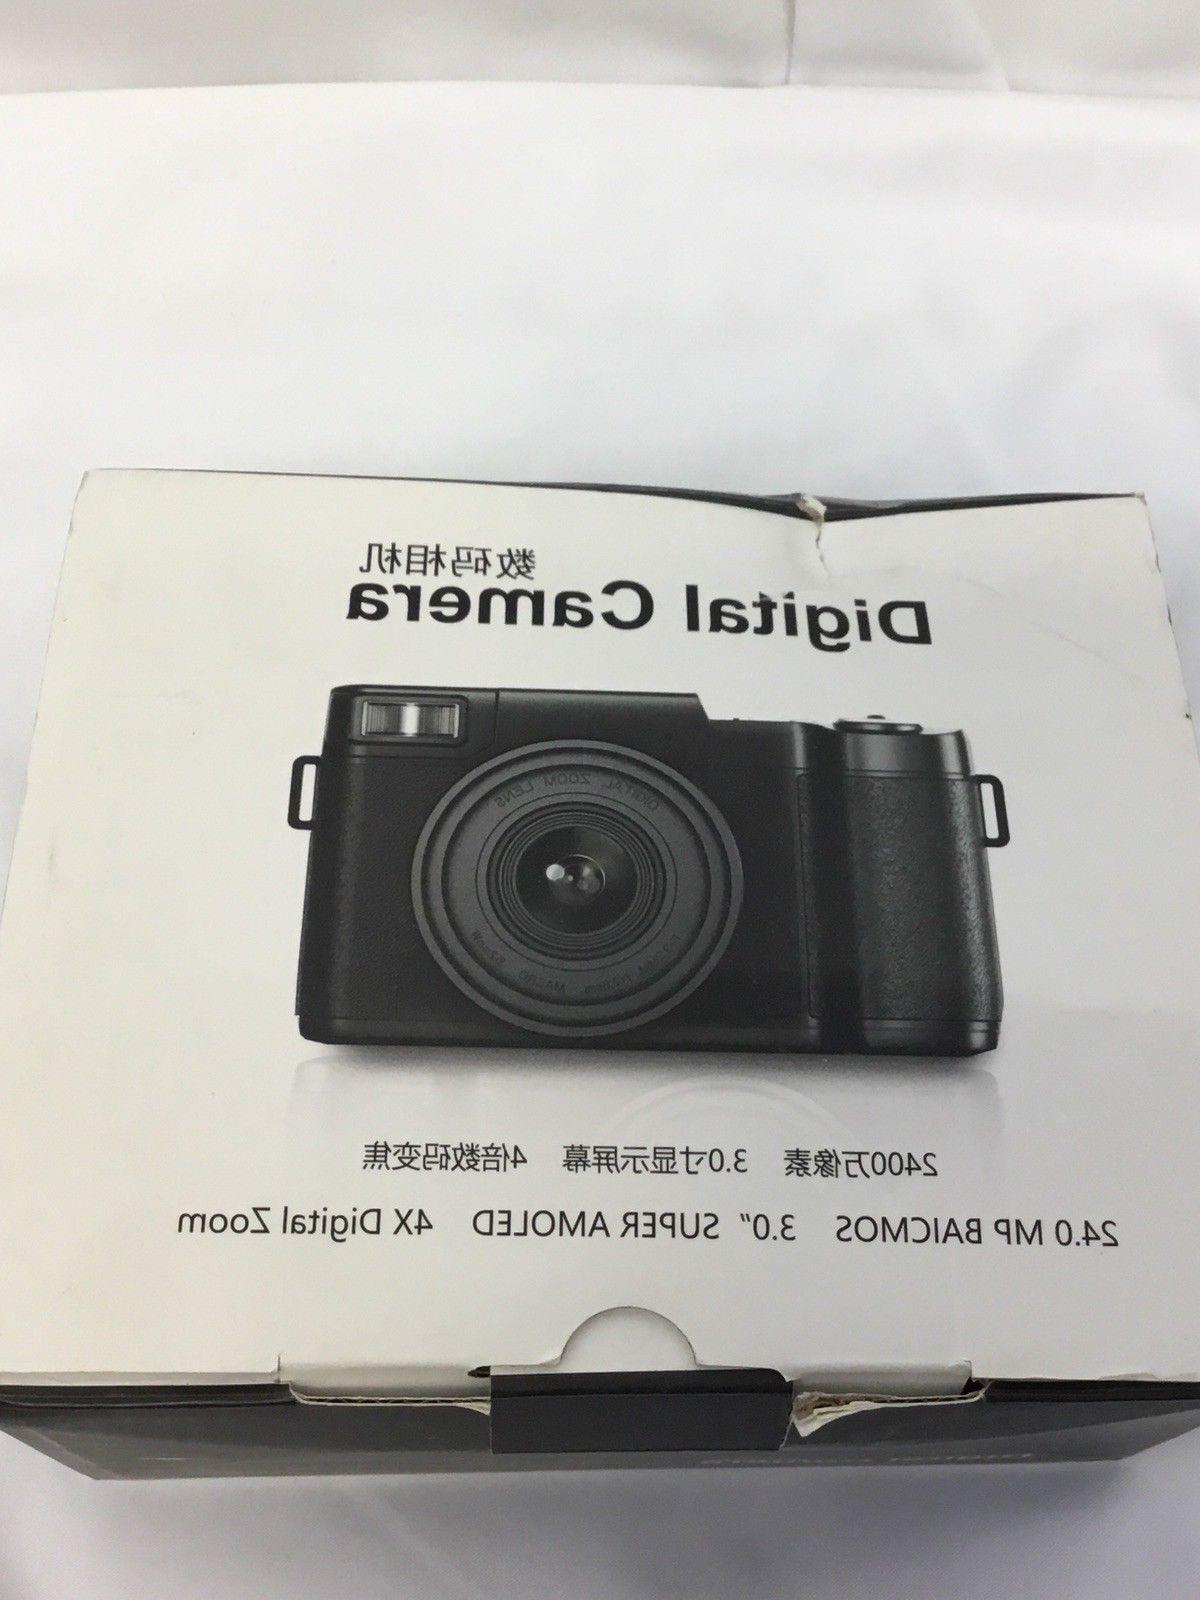 SEREE HD Camcorder Full HD 24.0 Megapixels Zoom